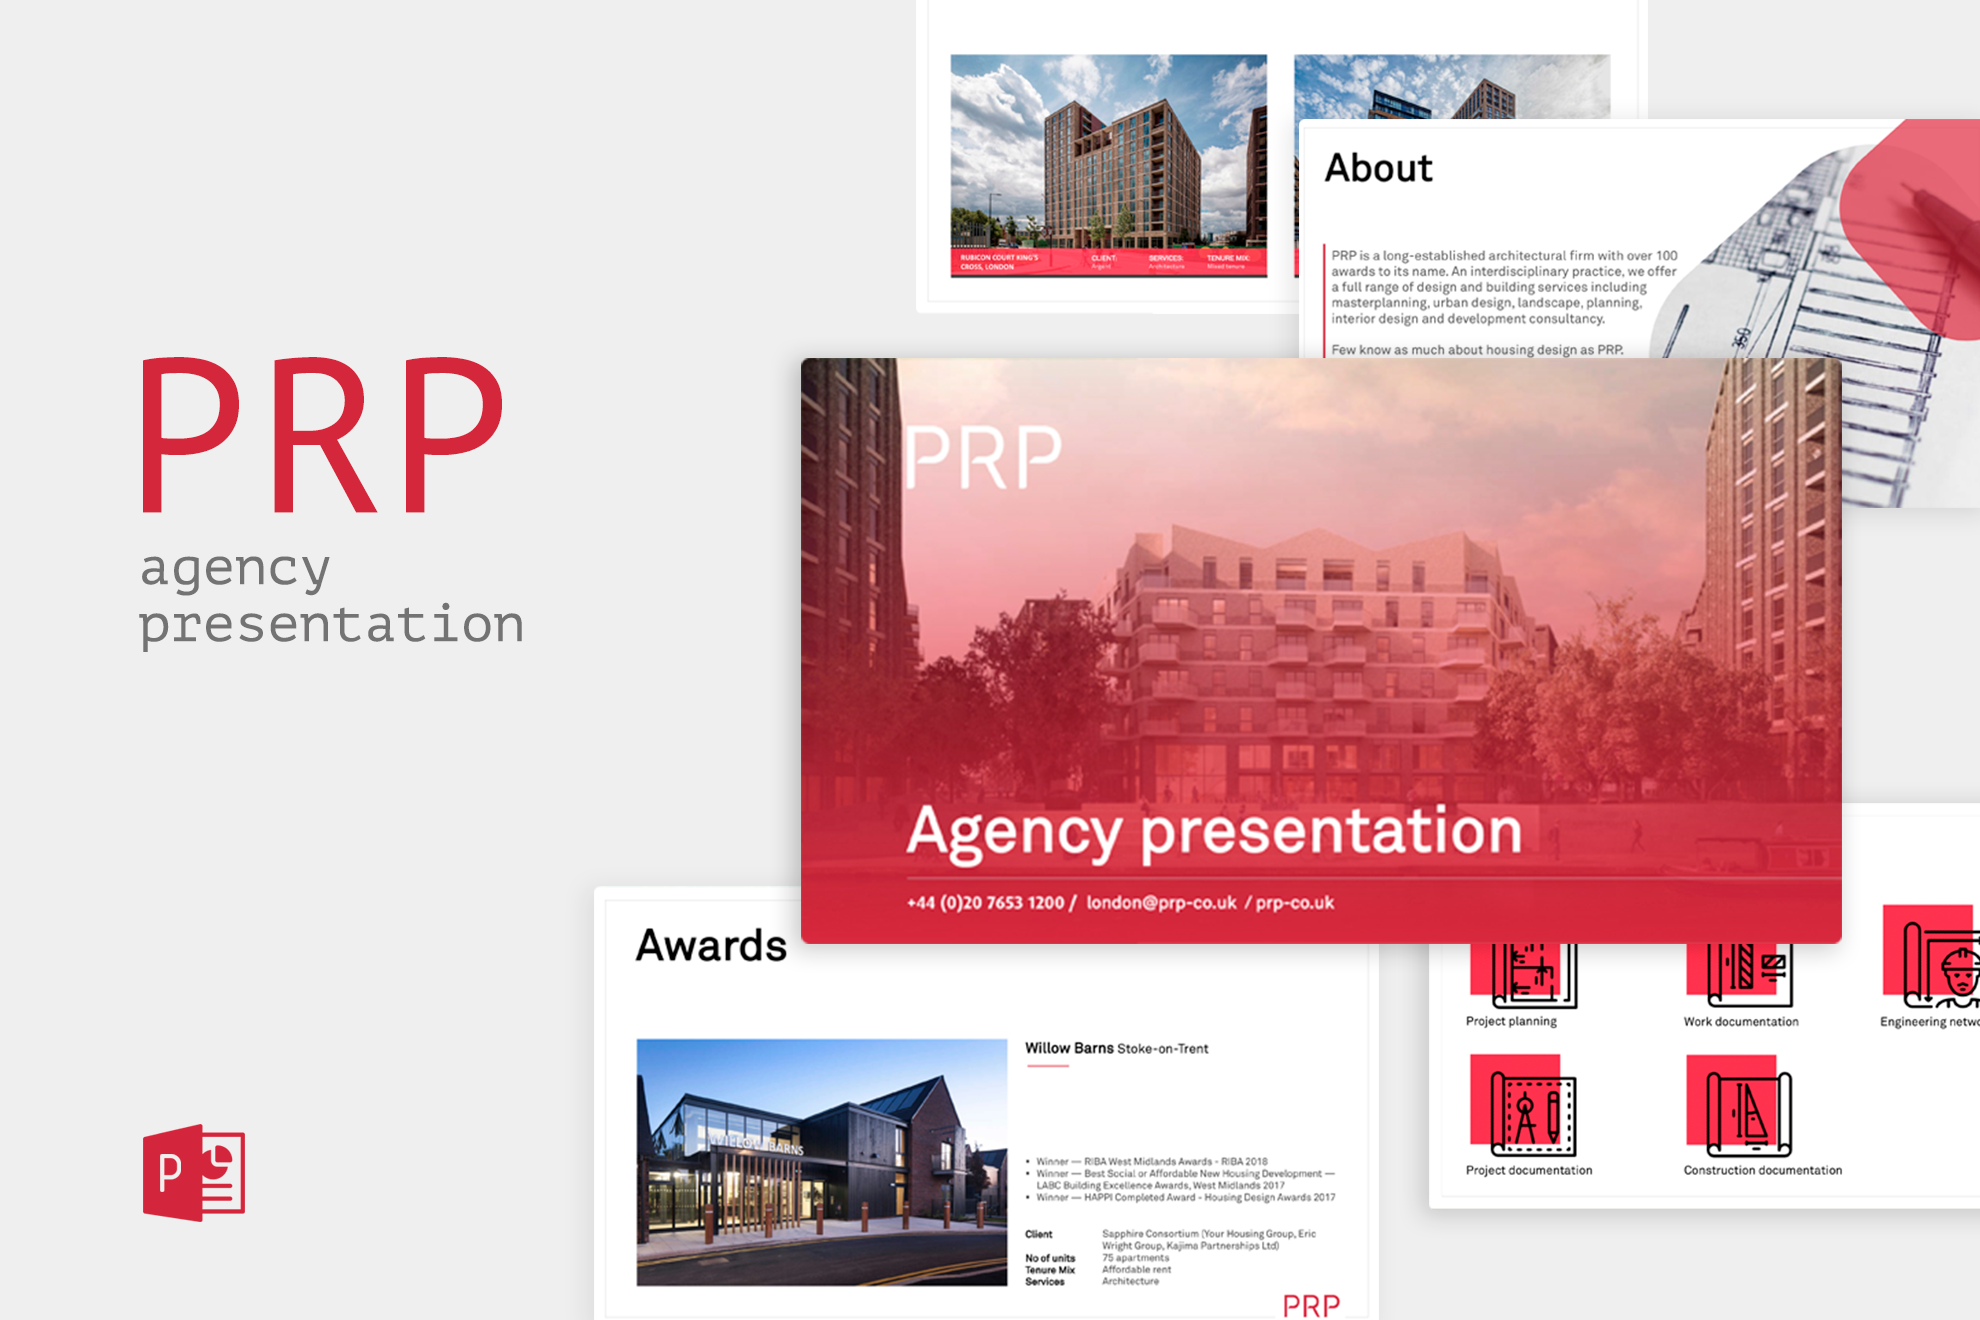 PRP // презентация архитектурного бюро